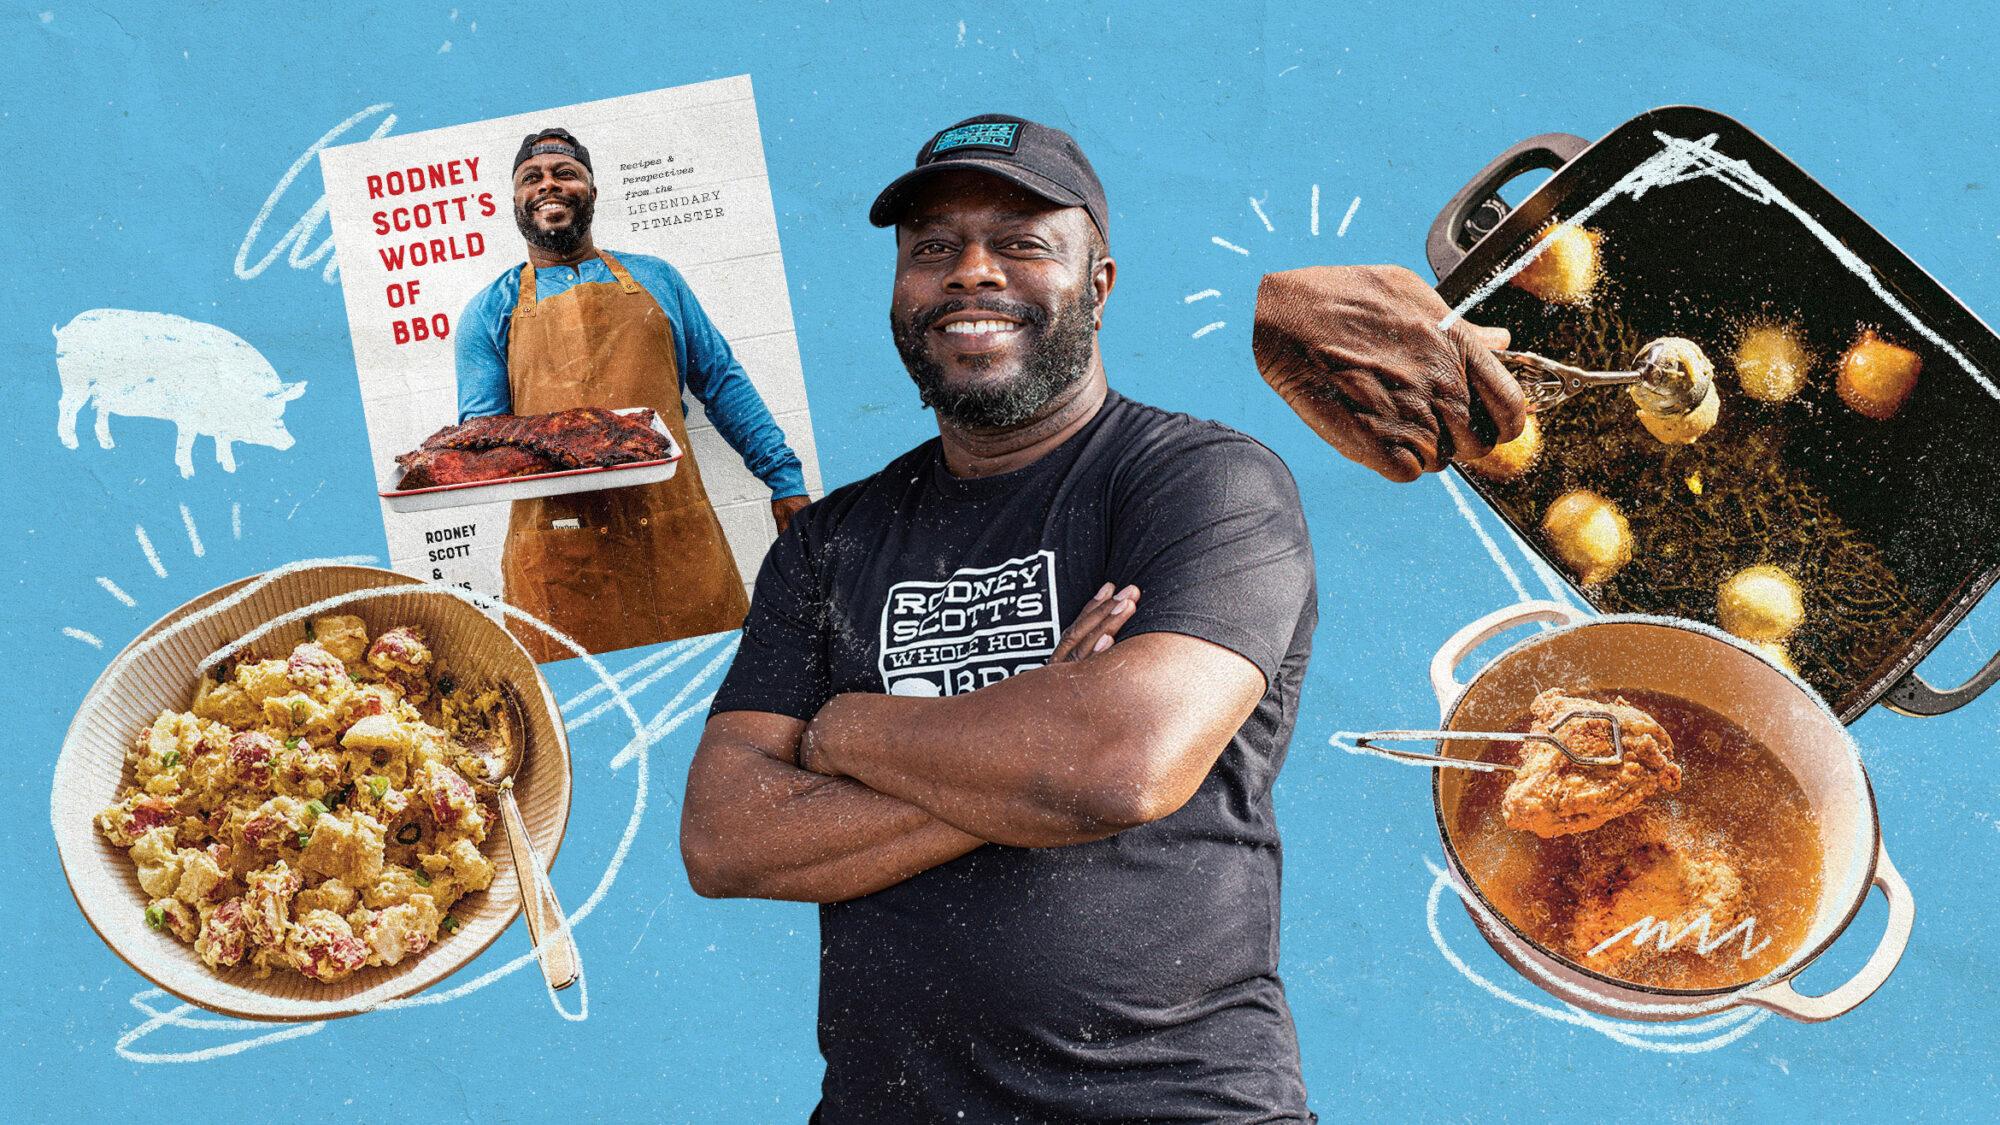 Article-Rodney-Scott-BBQ-Charleston